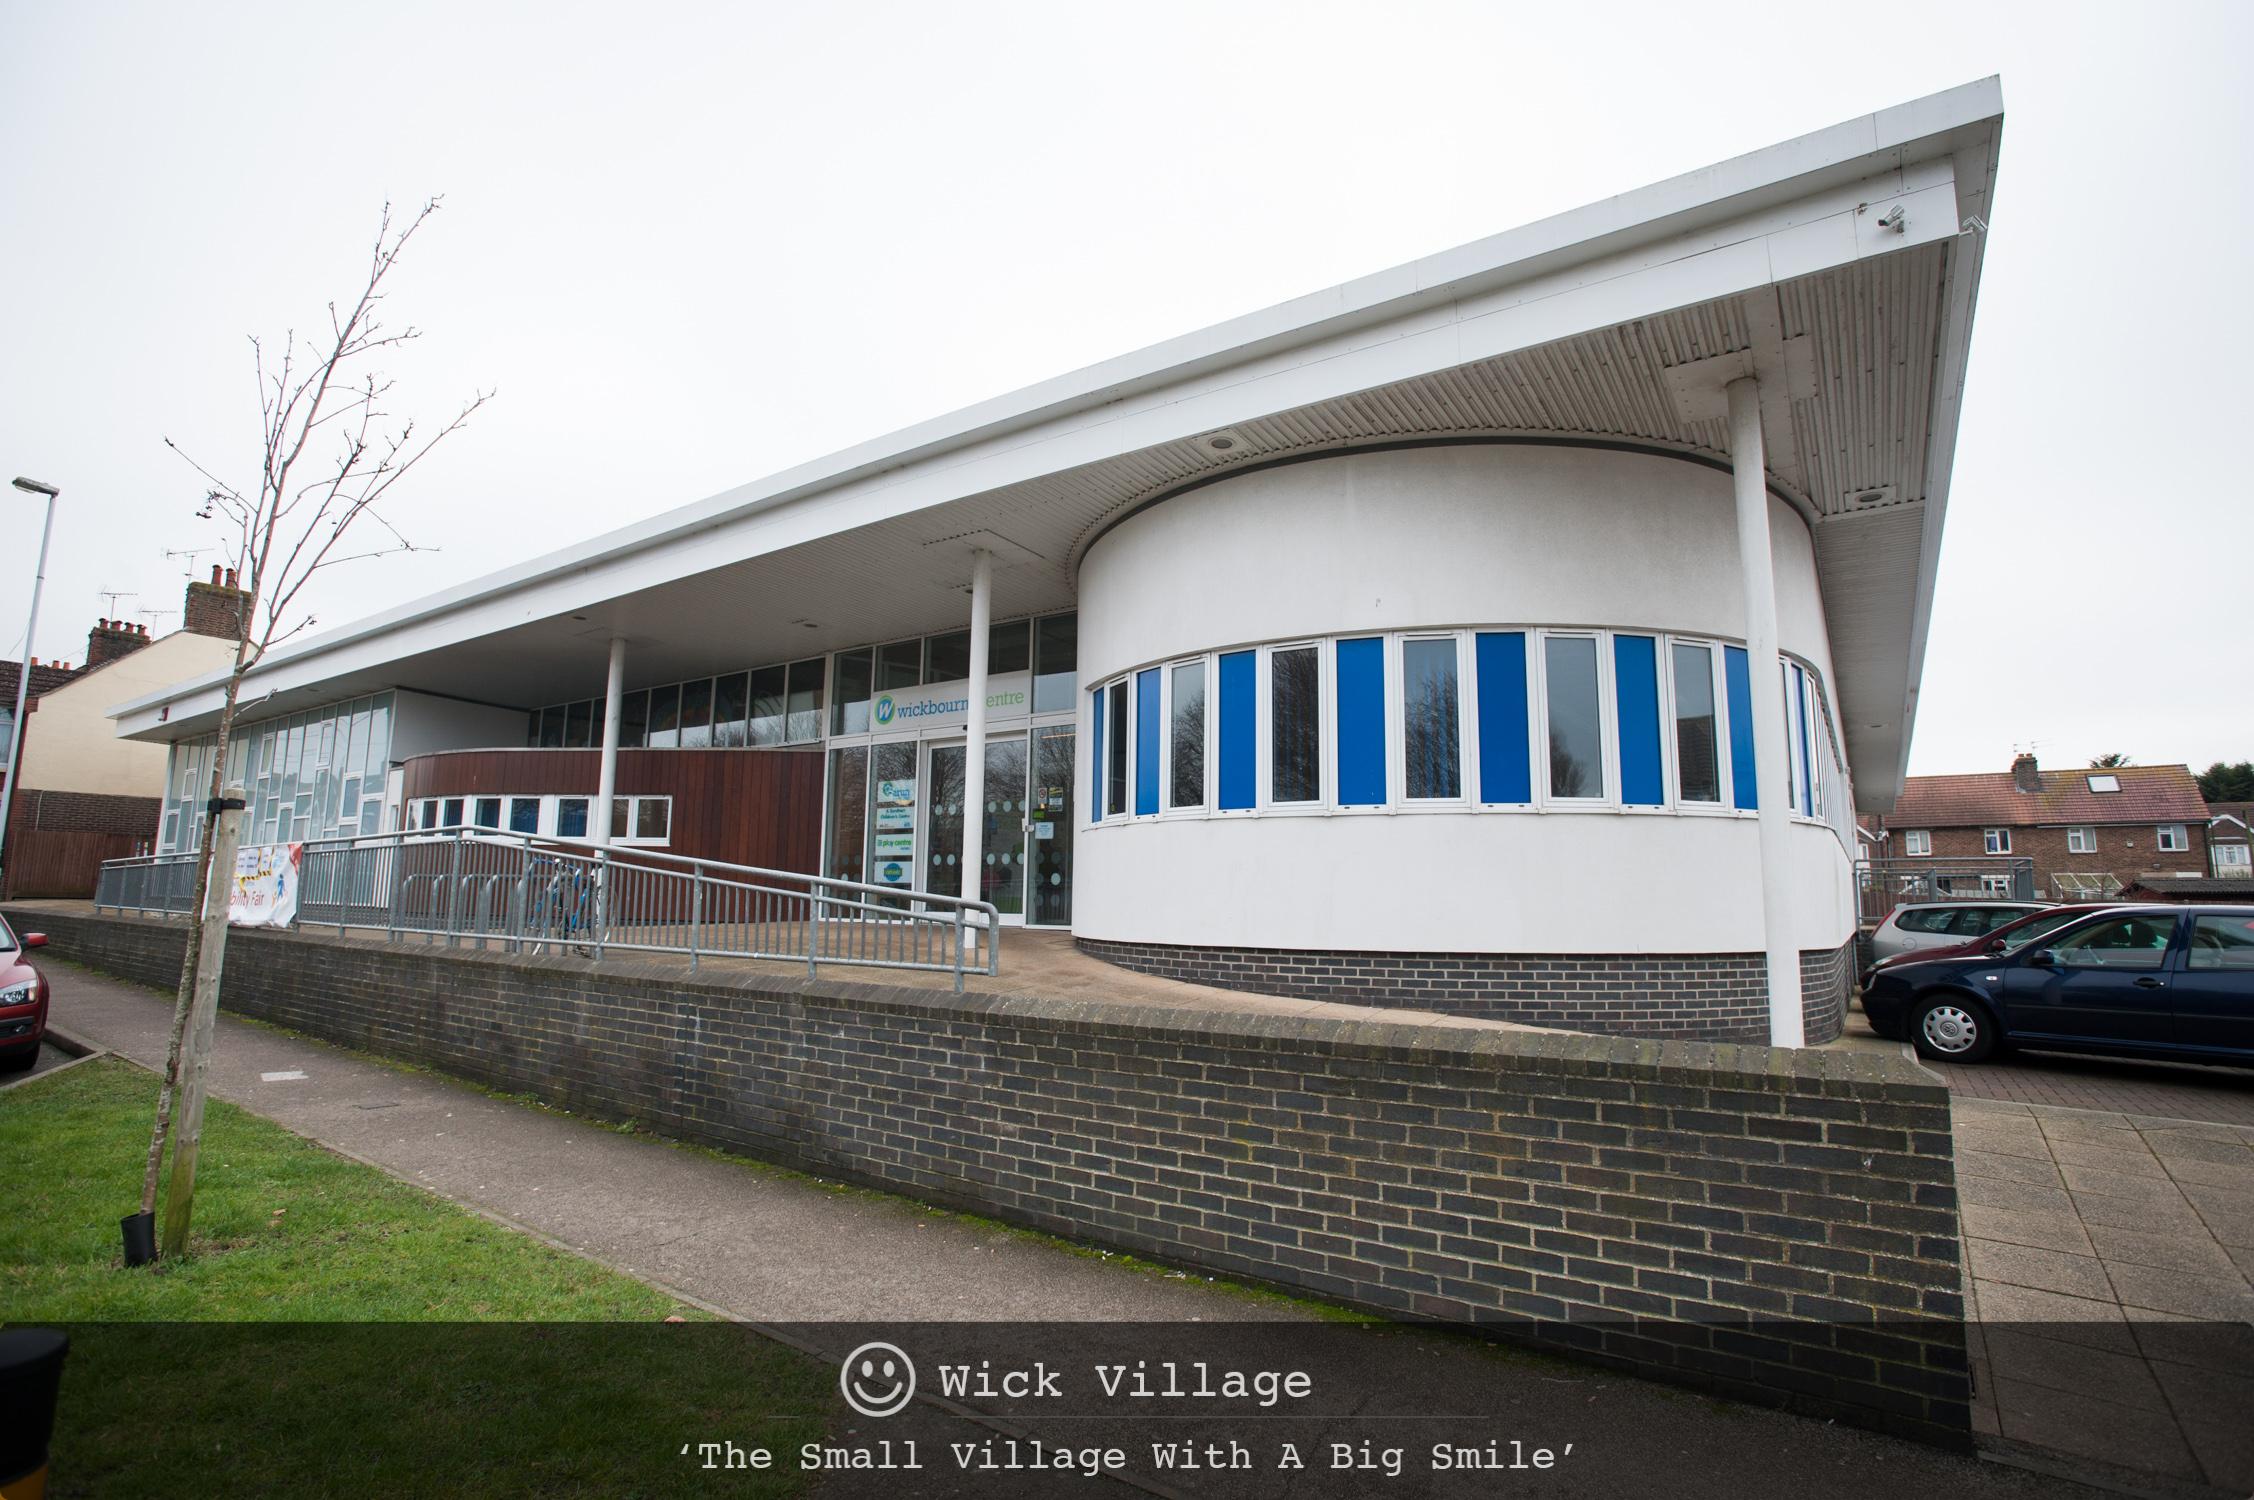 Children & Family Centre, Wick Village, Littlehampton.